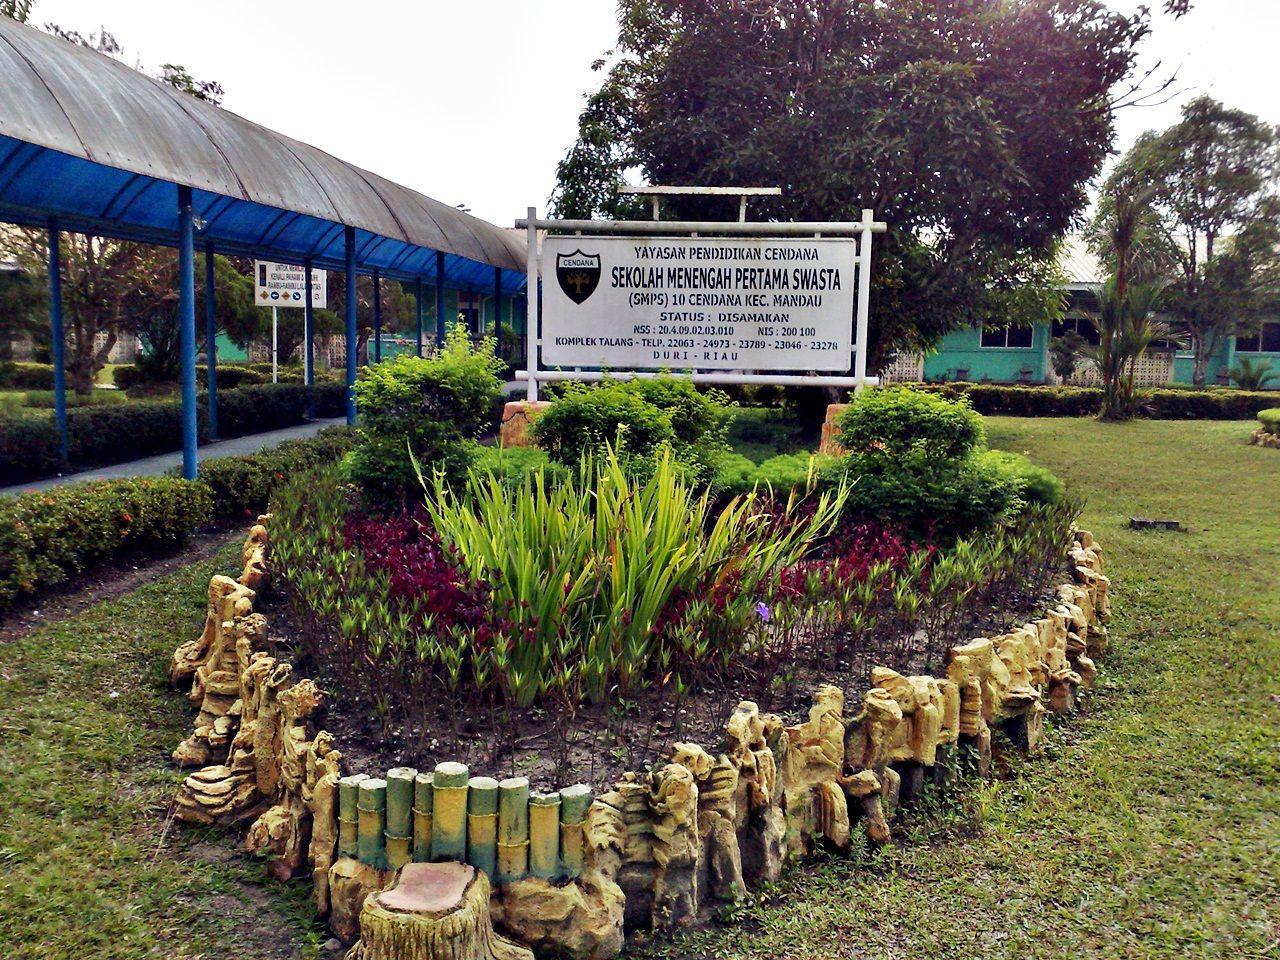 Cendana Duri Junior High School